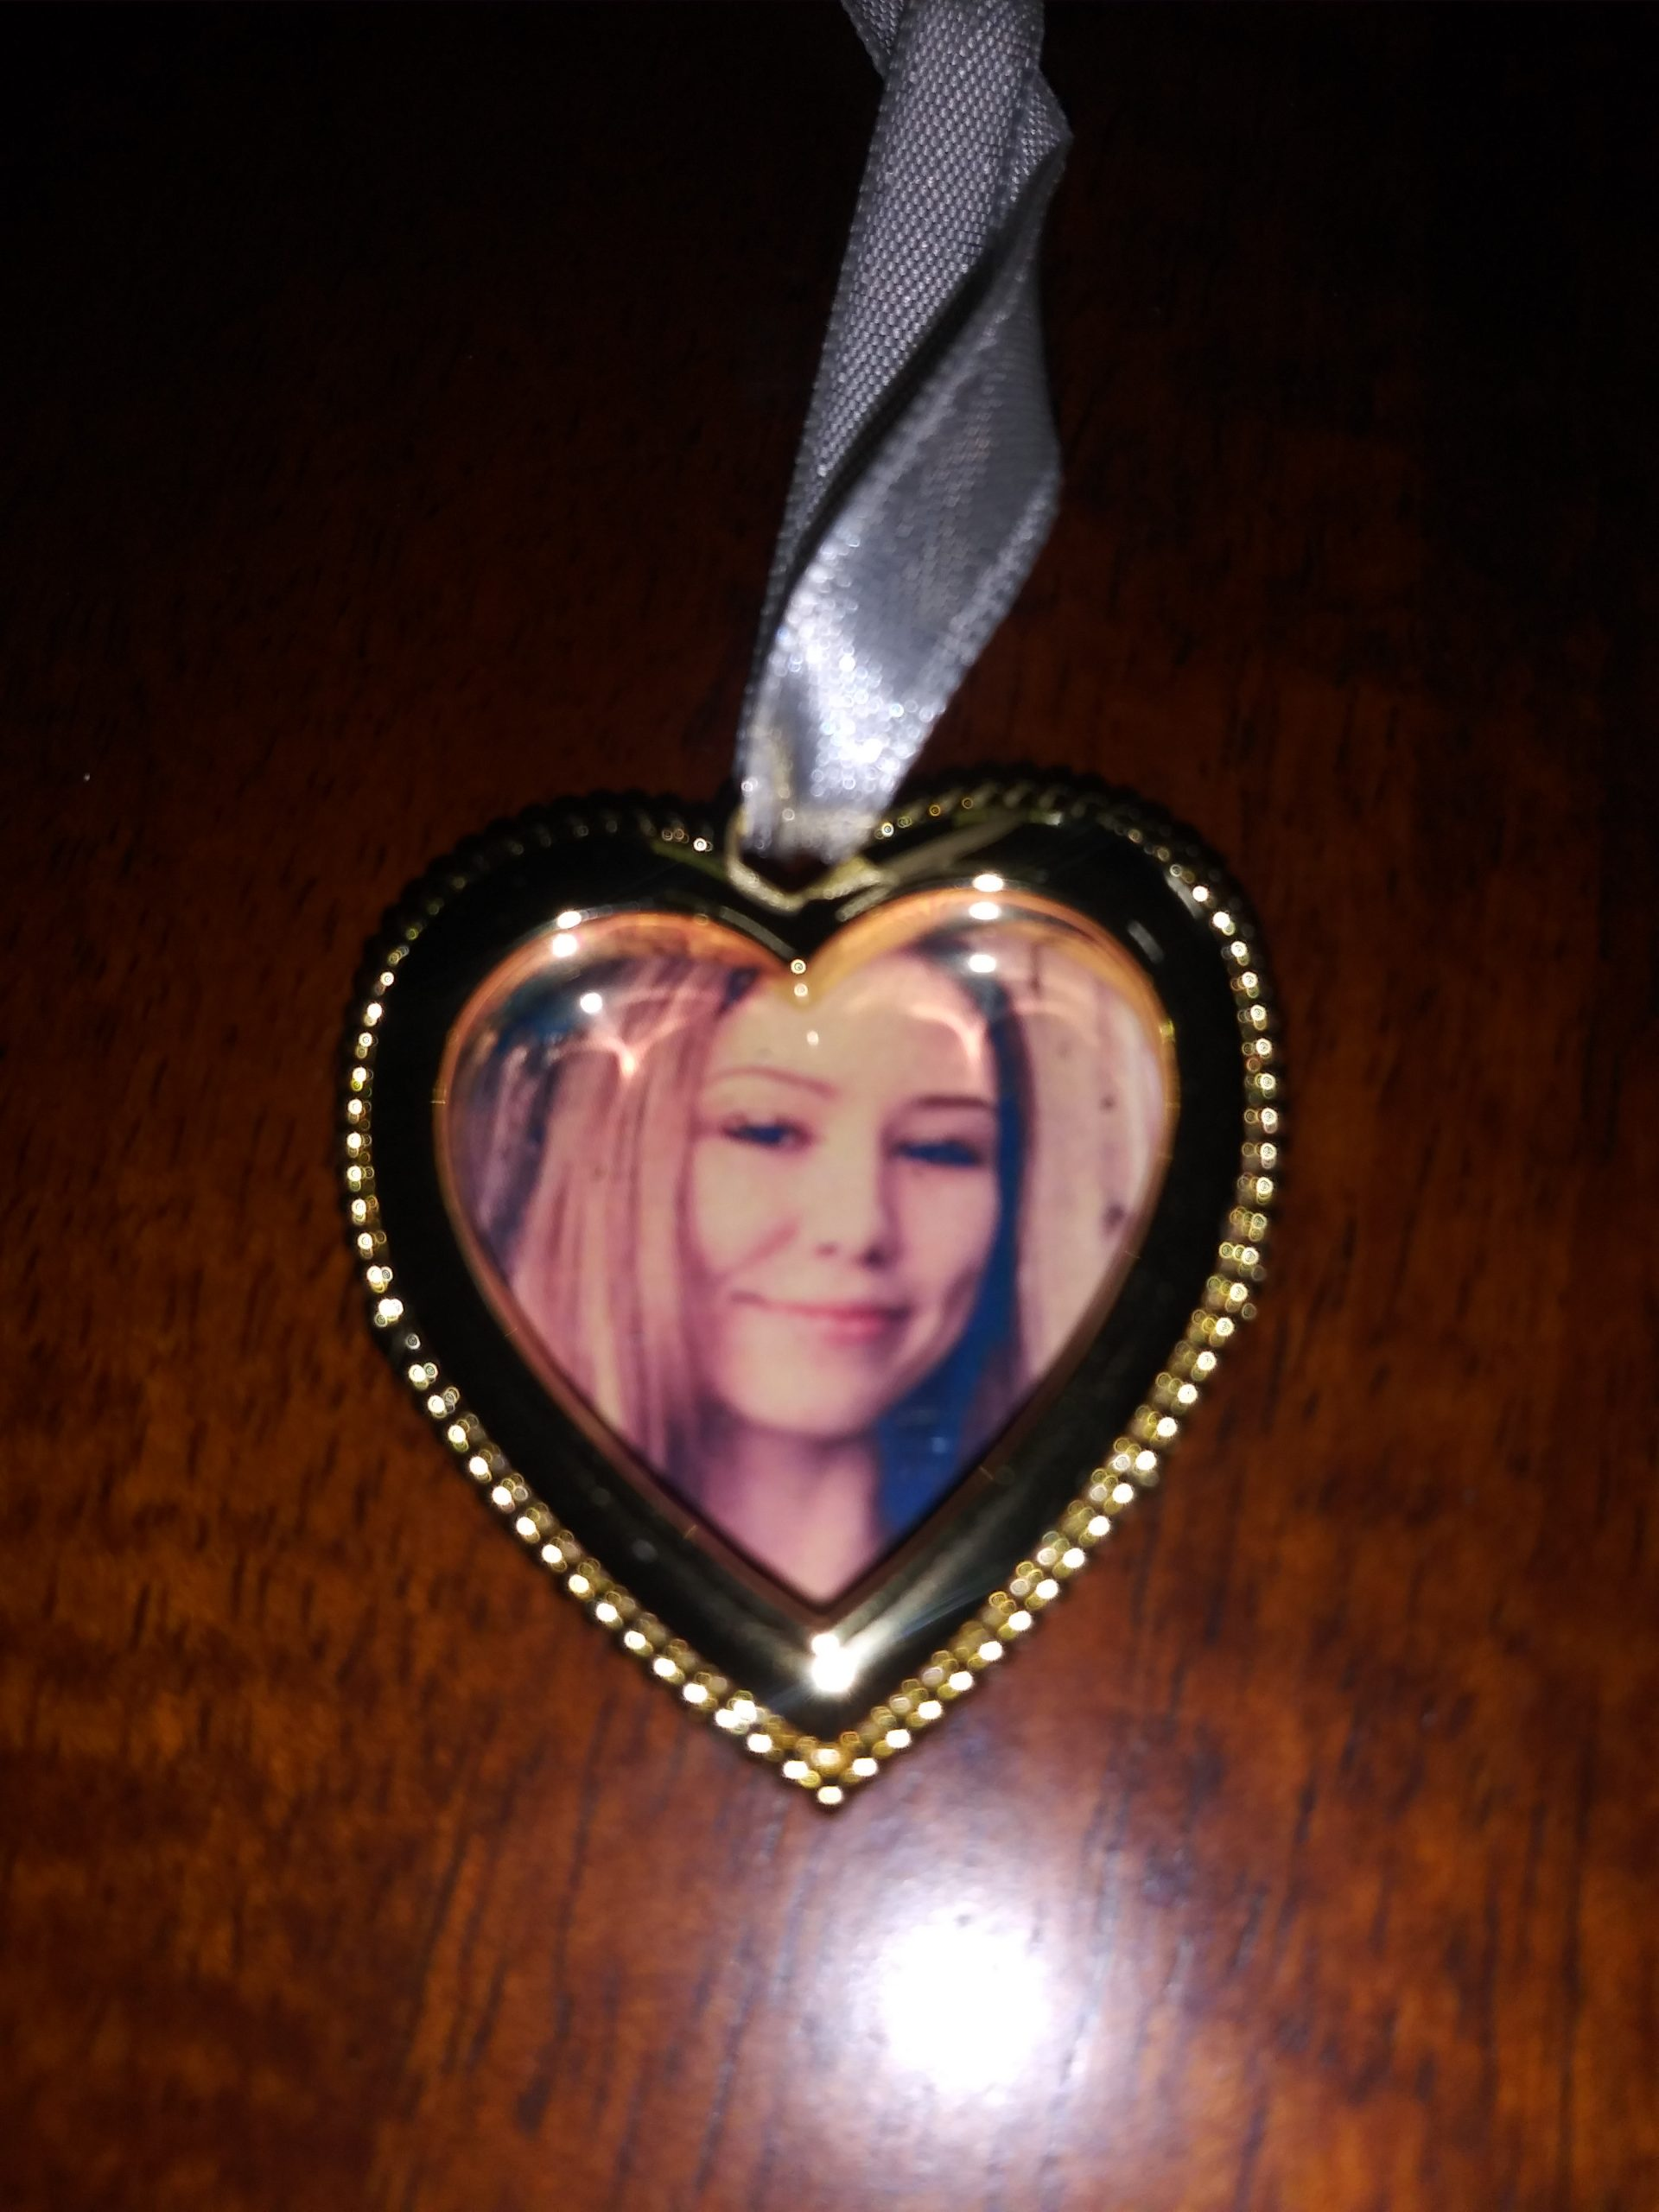 Caitlin Frangel's pendant